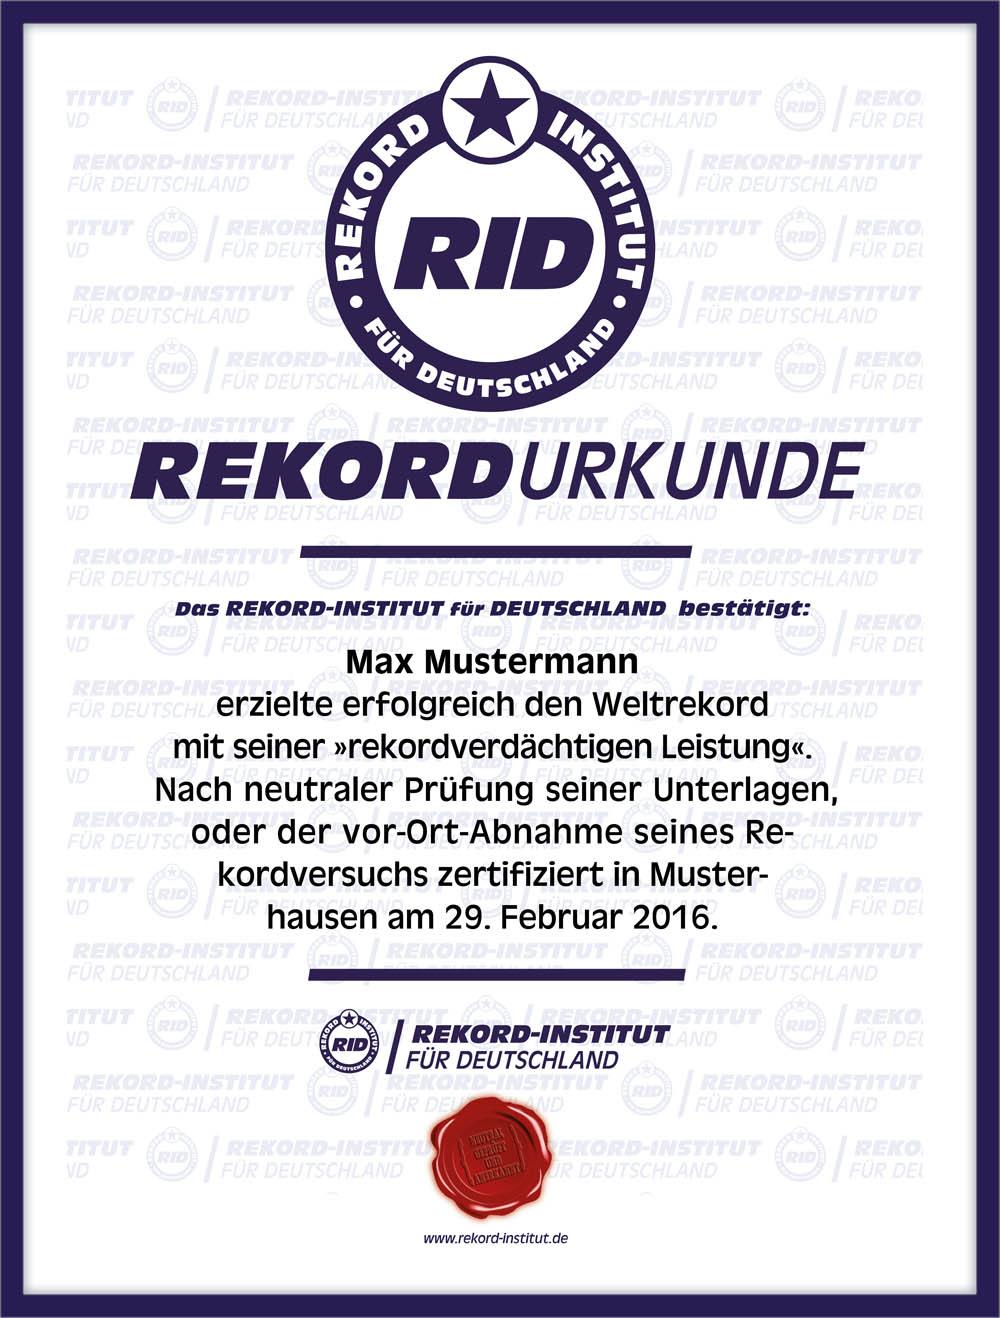 RID-Rekordurkunde